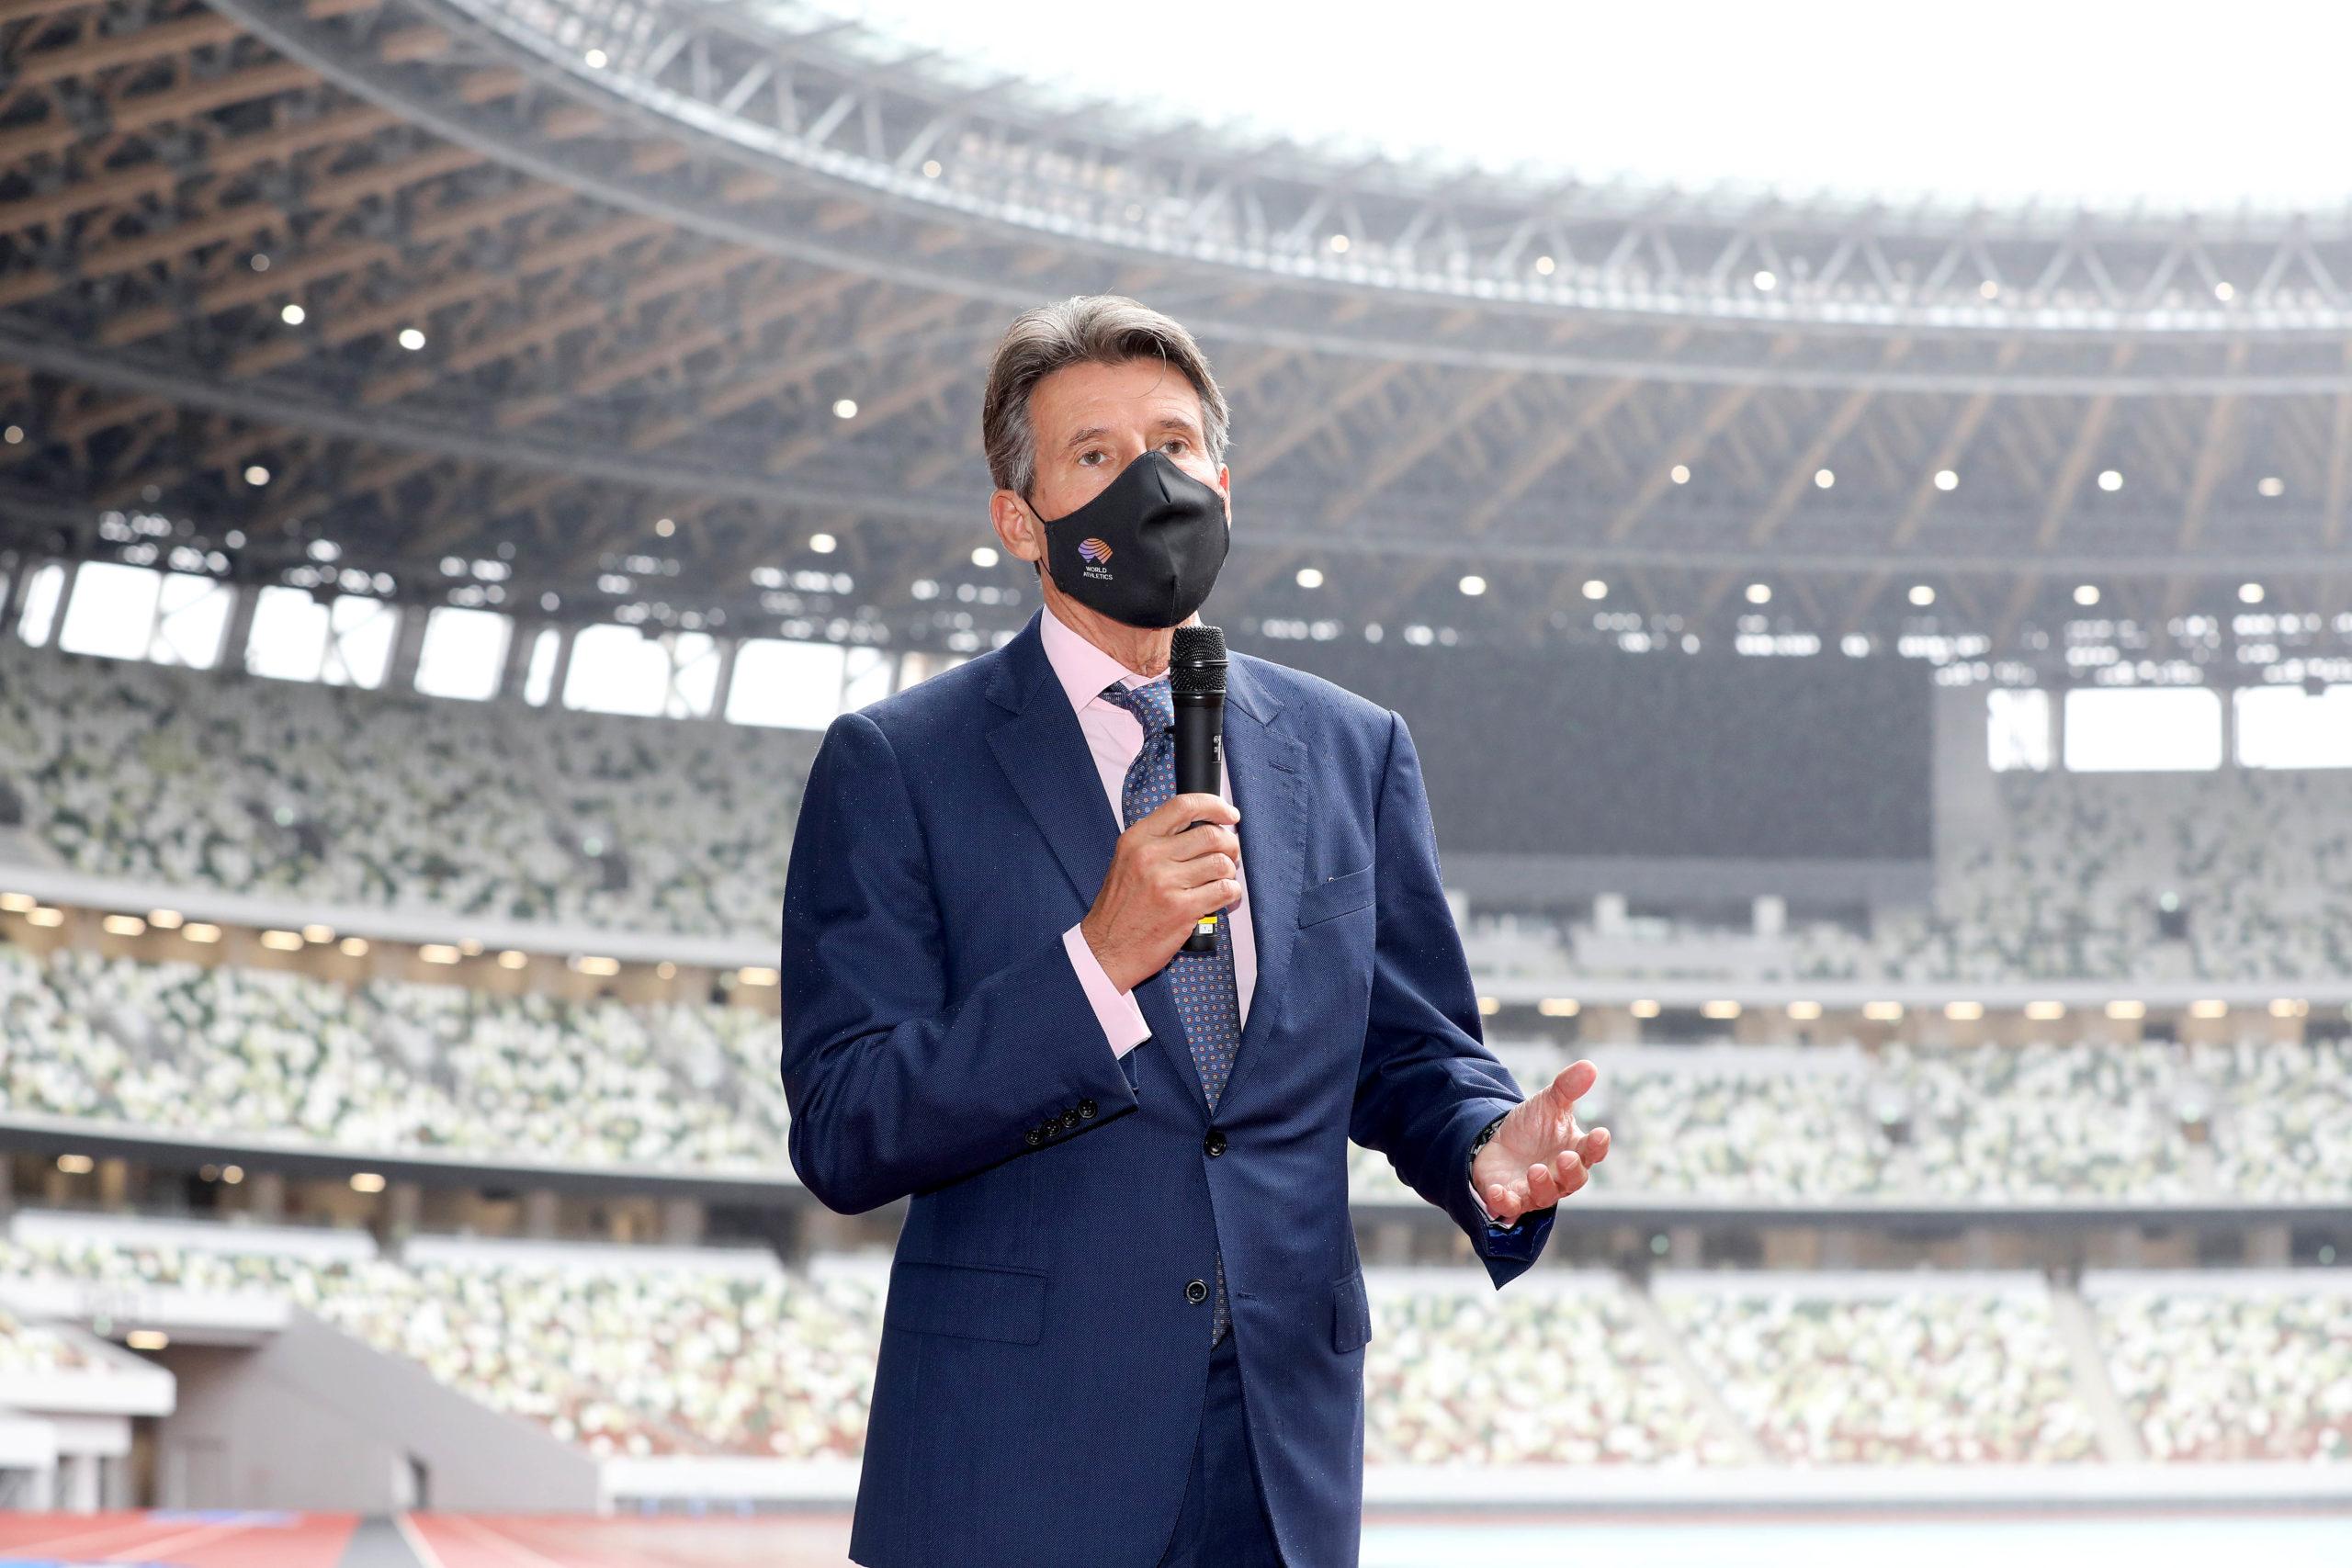 【TF】WAコー会長が国立競技場を視察「世界選手権を開催したい」